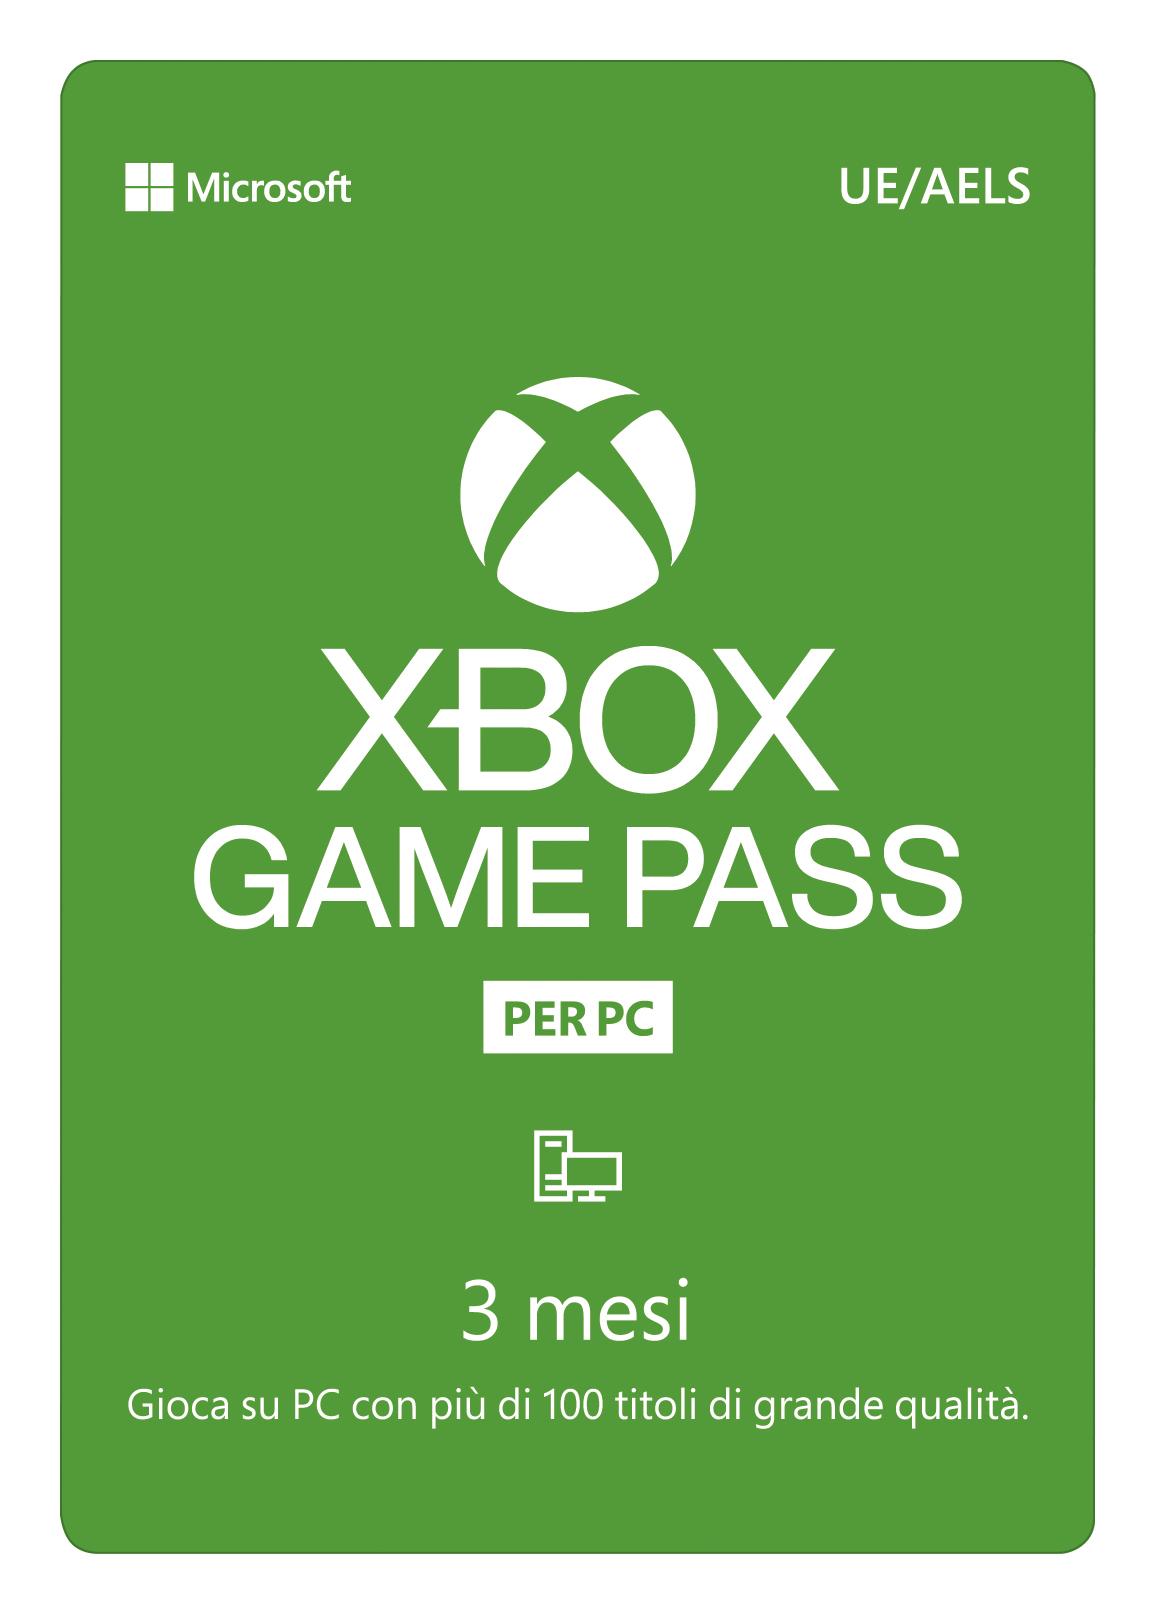 Euronet  - Gamepass Per Pc 3 Mesi 29,99